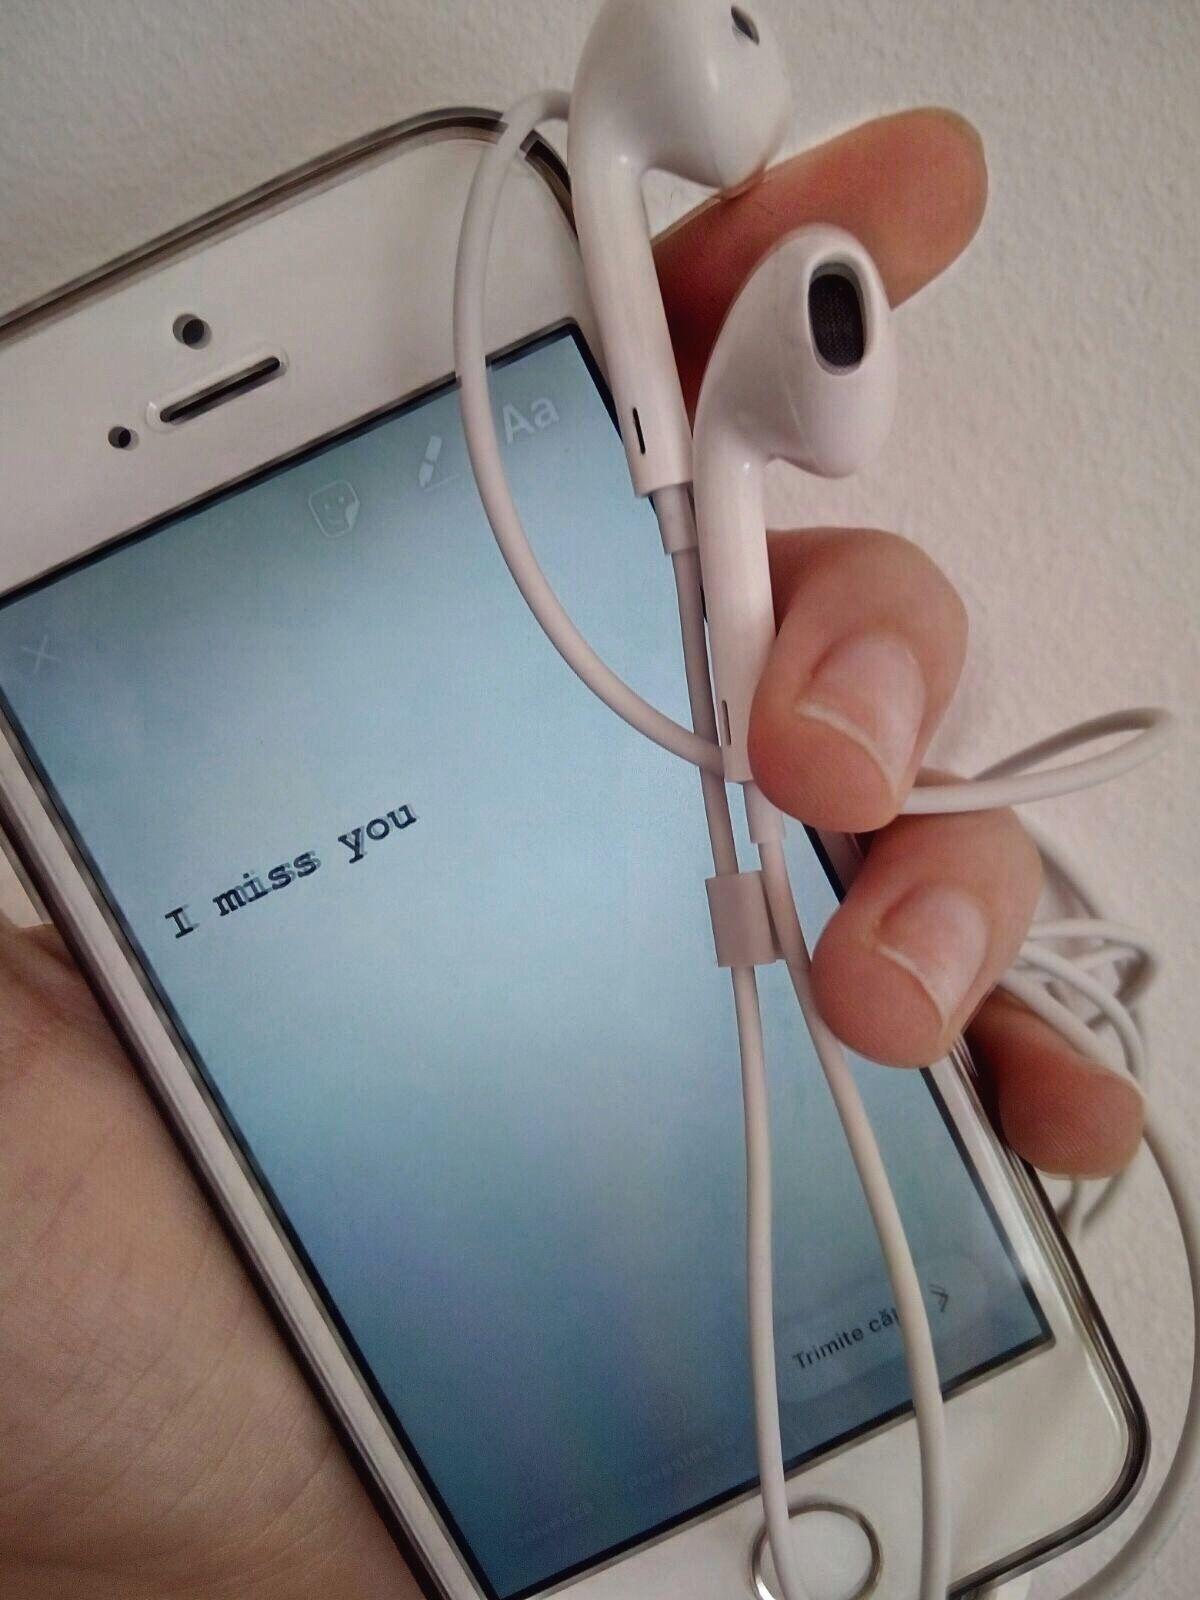 tumblr aesthetic indie grunge quotes phone headphones white imissyou sayings weheartit vsco wall iphone knizhnaya fotografiya kartinki naushniki pinterest